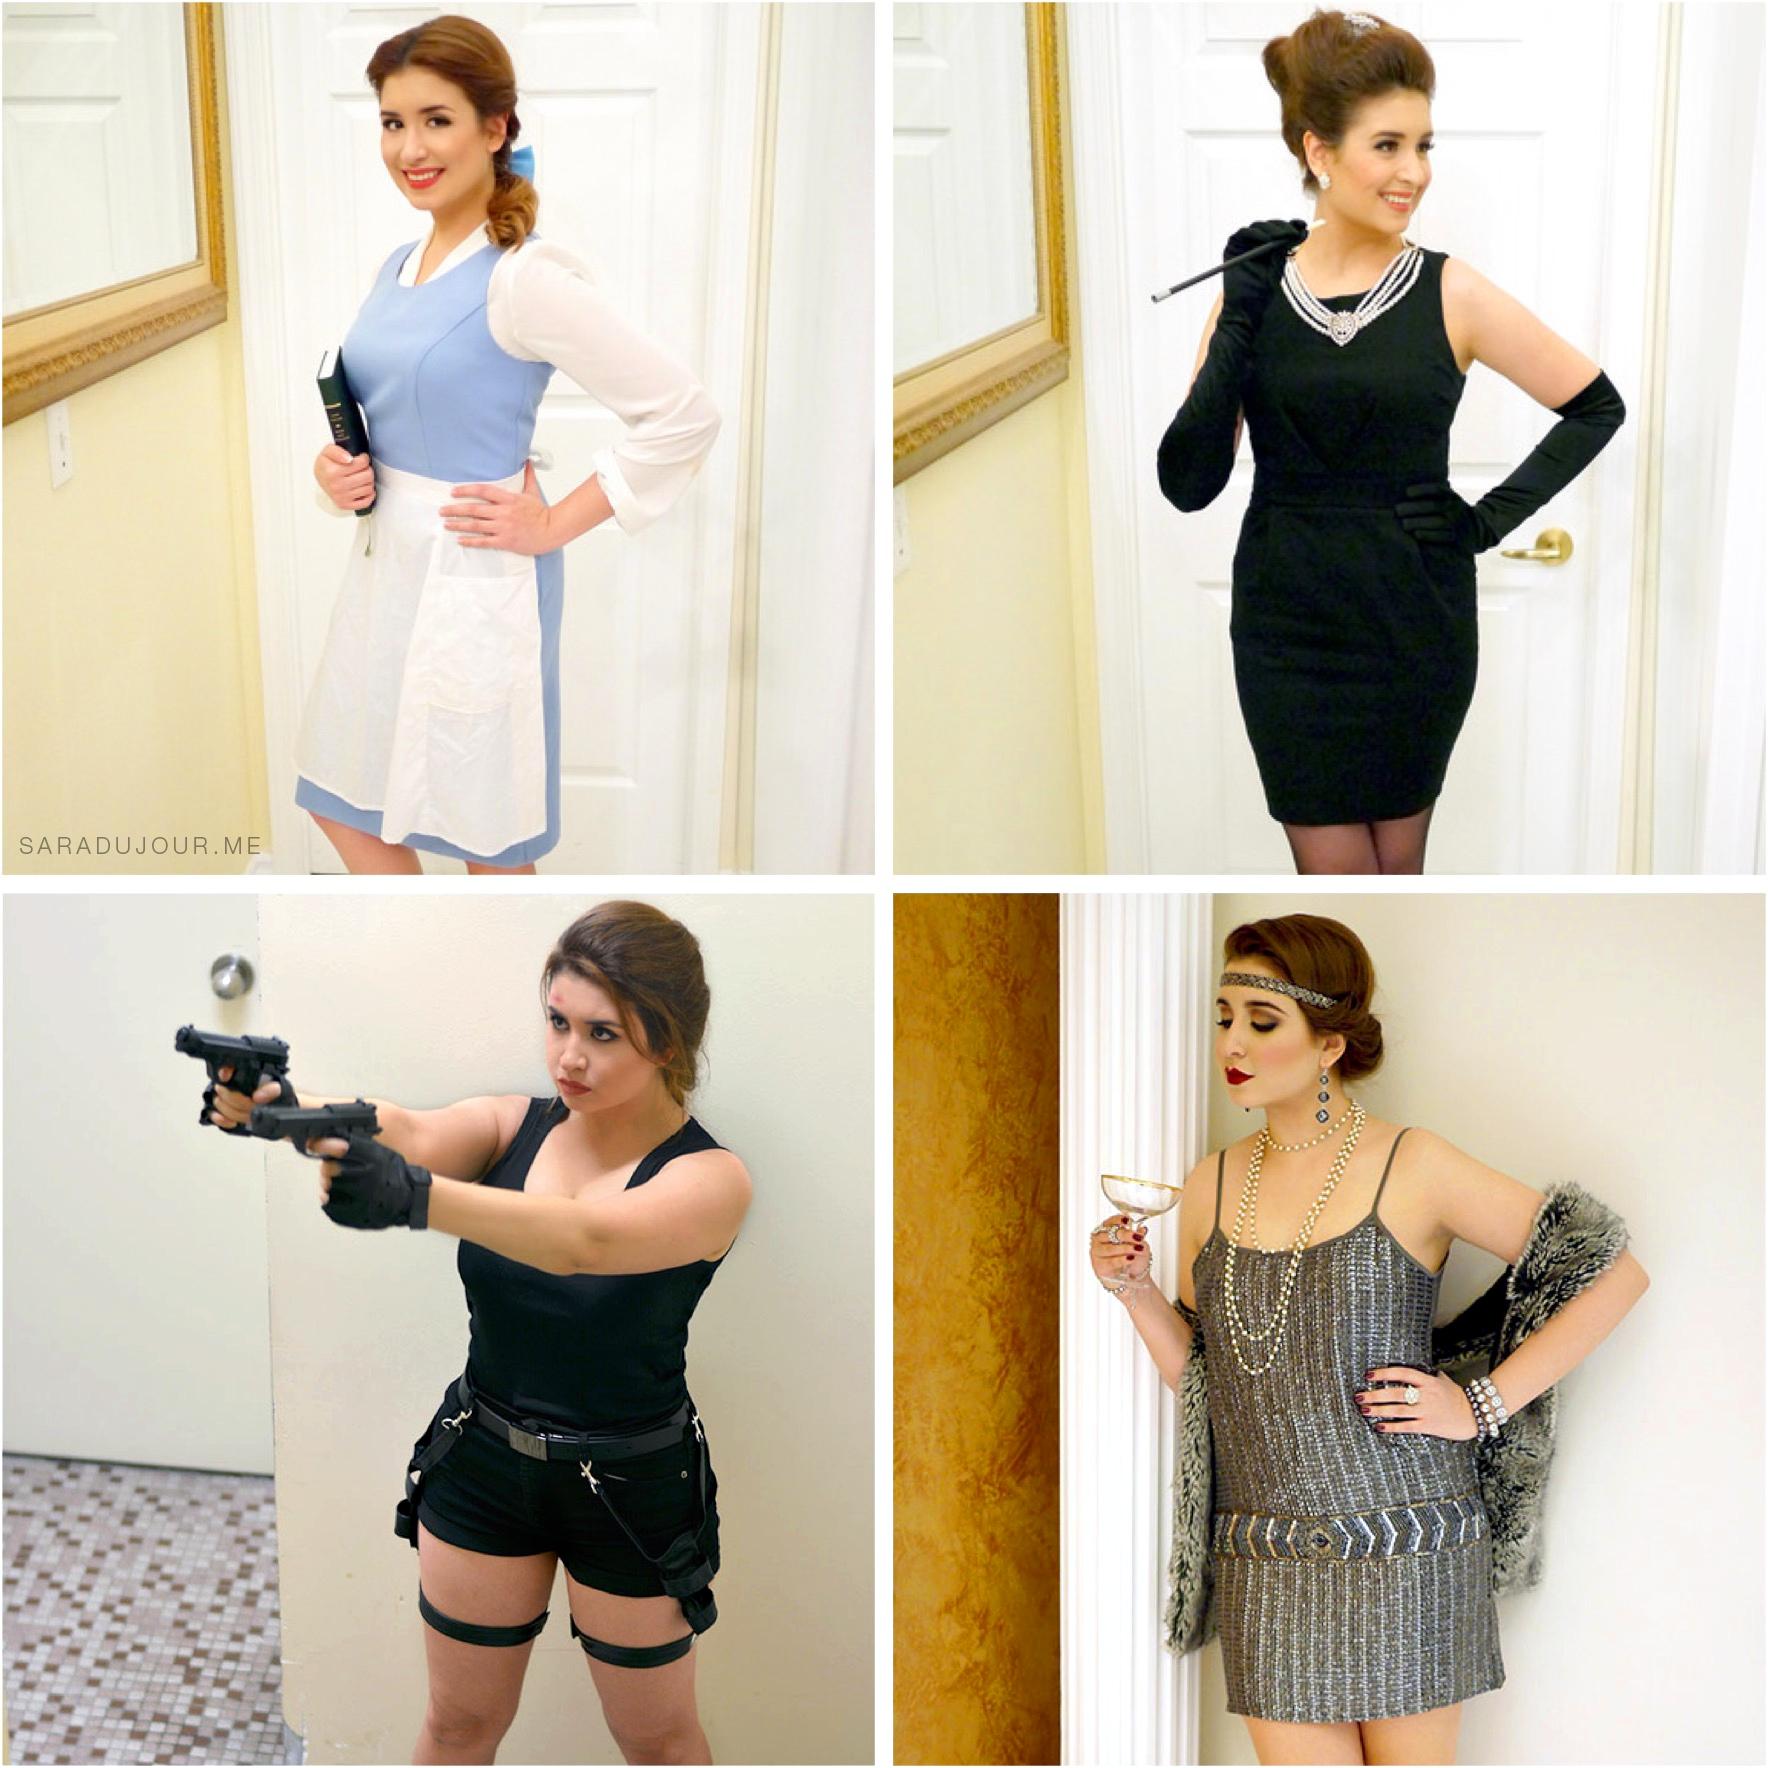 10 Ideal Easy Costume Ideas For Women 4 easy halloween costume ideas e280a2 sara du jour 2020